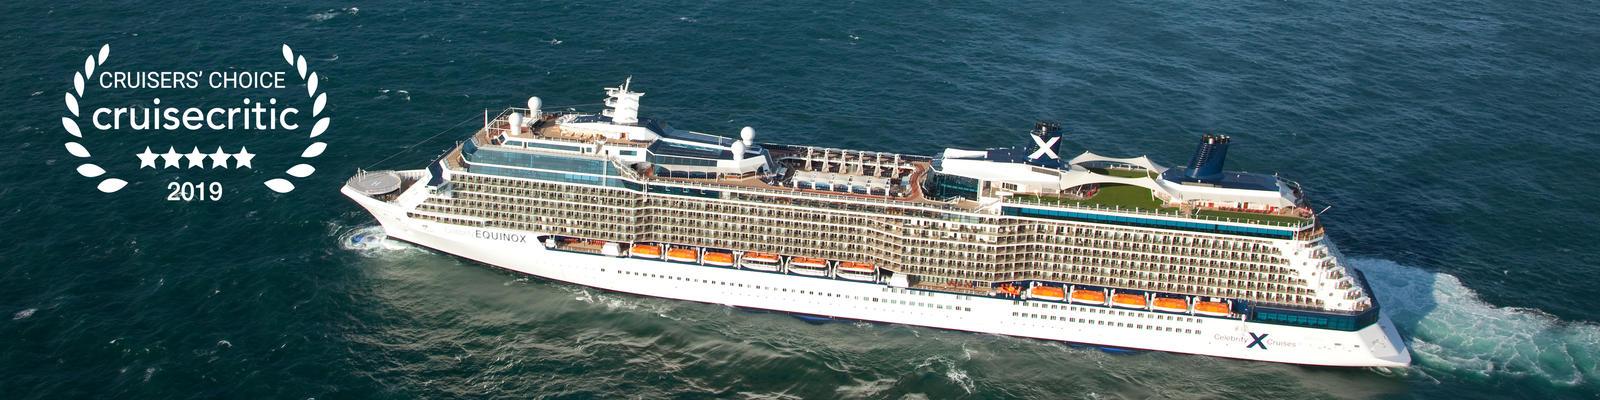 Cruise Critic's 2019 Cruisers' Choice Award Winners